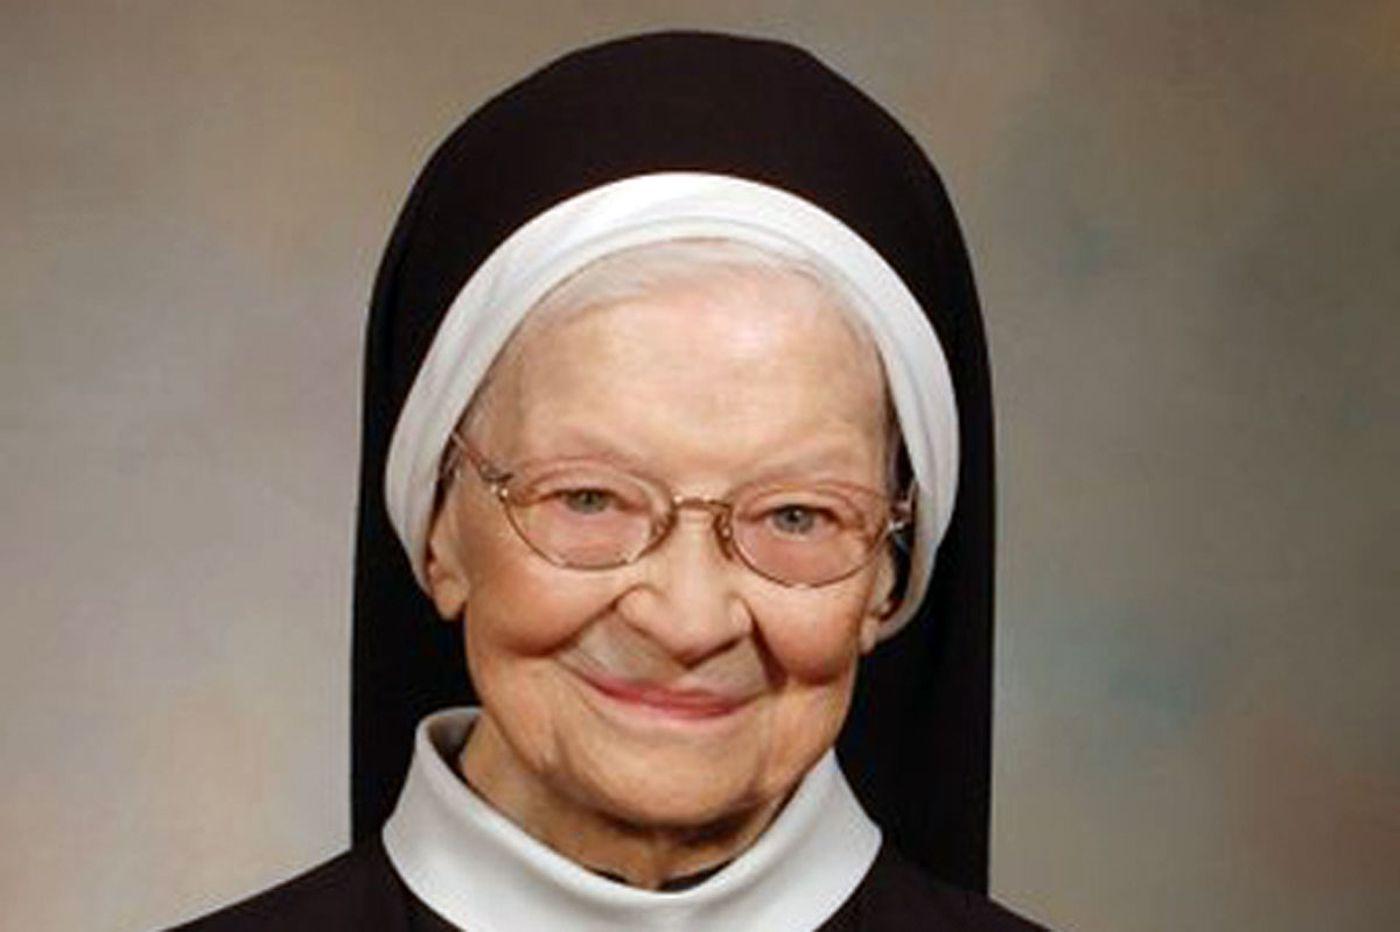 Sister Emellia Prokopik, 95